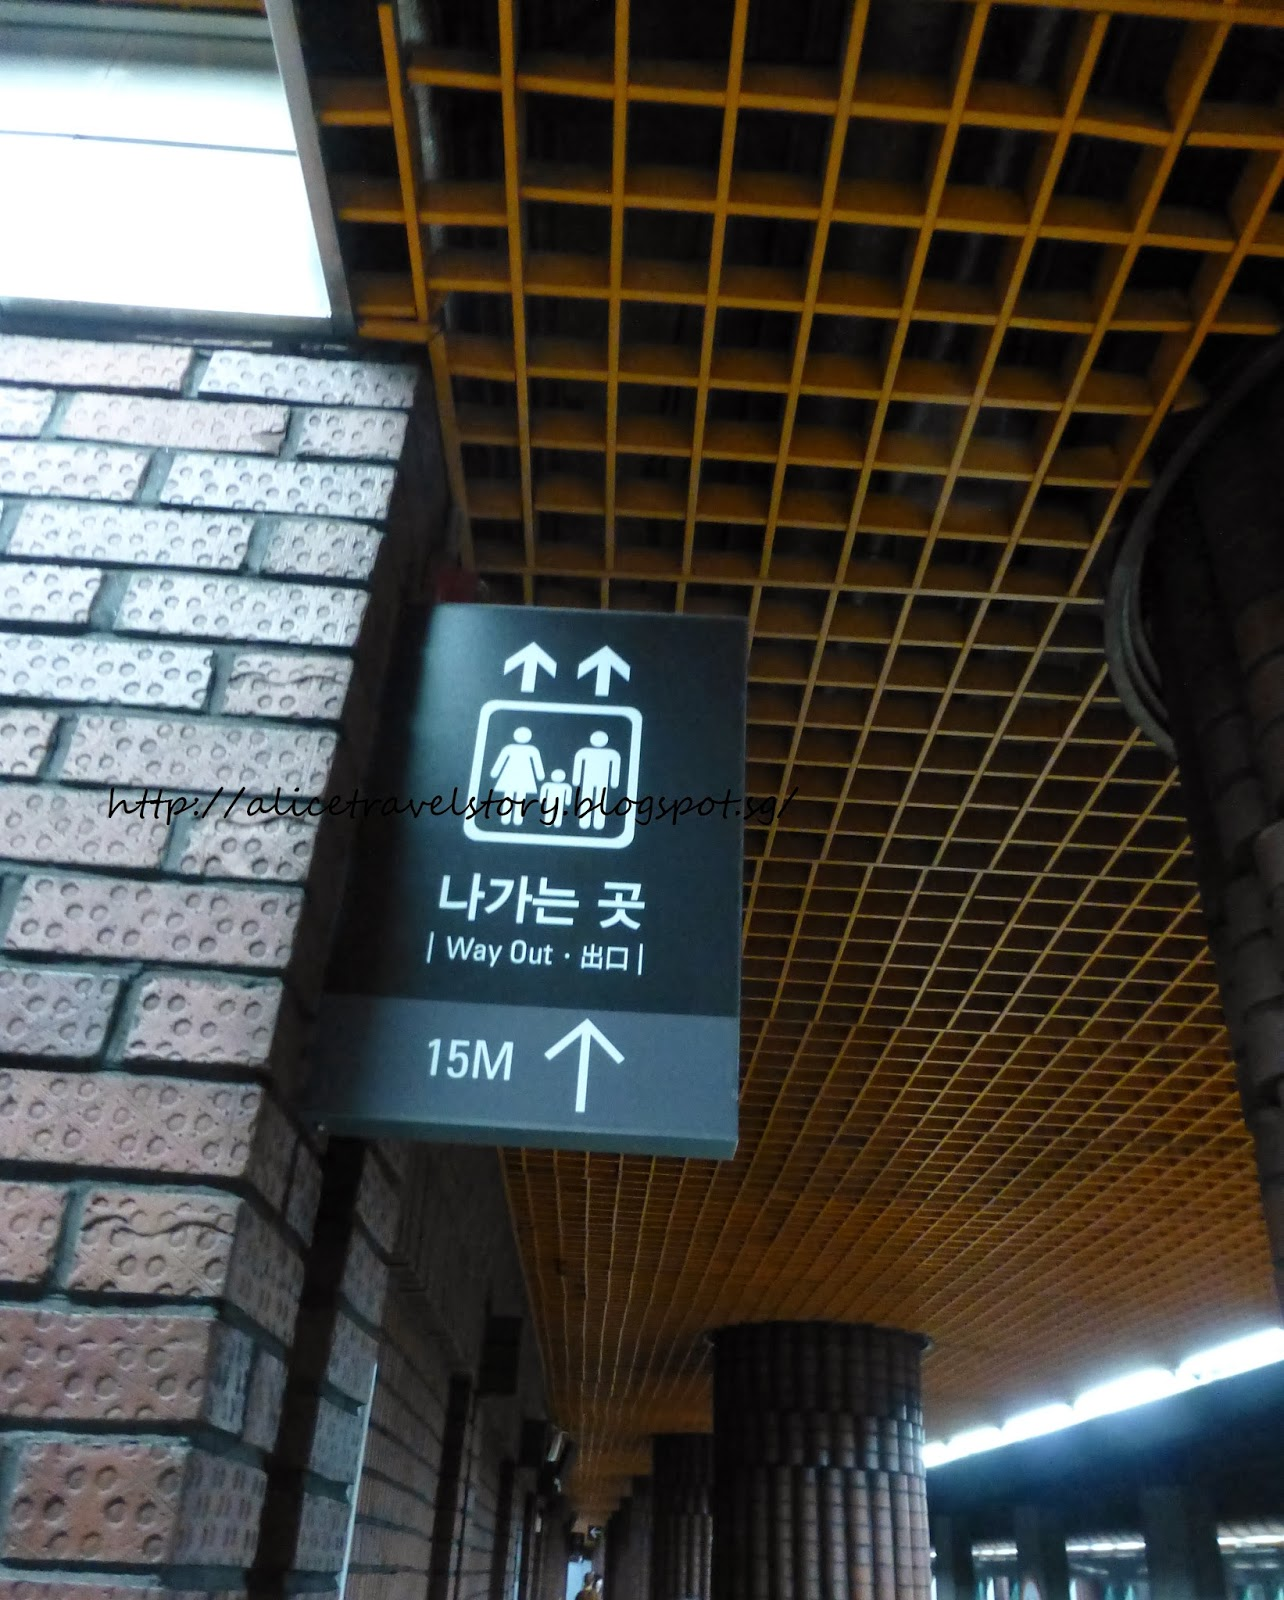 Seoul Station (서울역) | Official Korea Tourism Organization